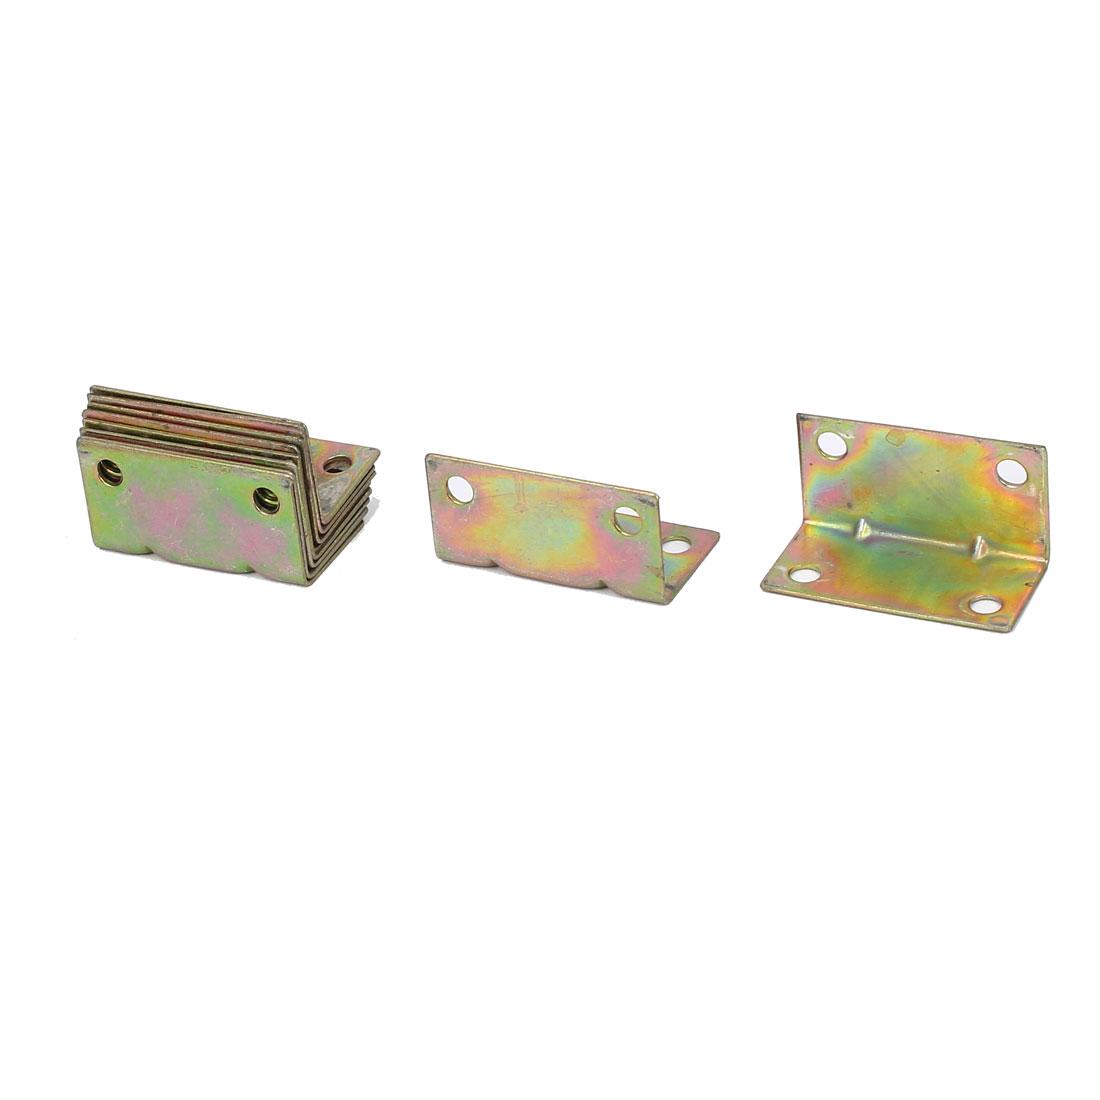 L Shape Corner Brace Joint Right Angle Bracket 20x20x38mm Bronze Tone 10pcs